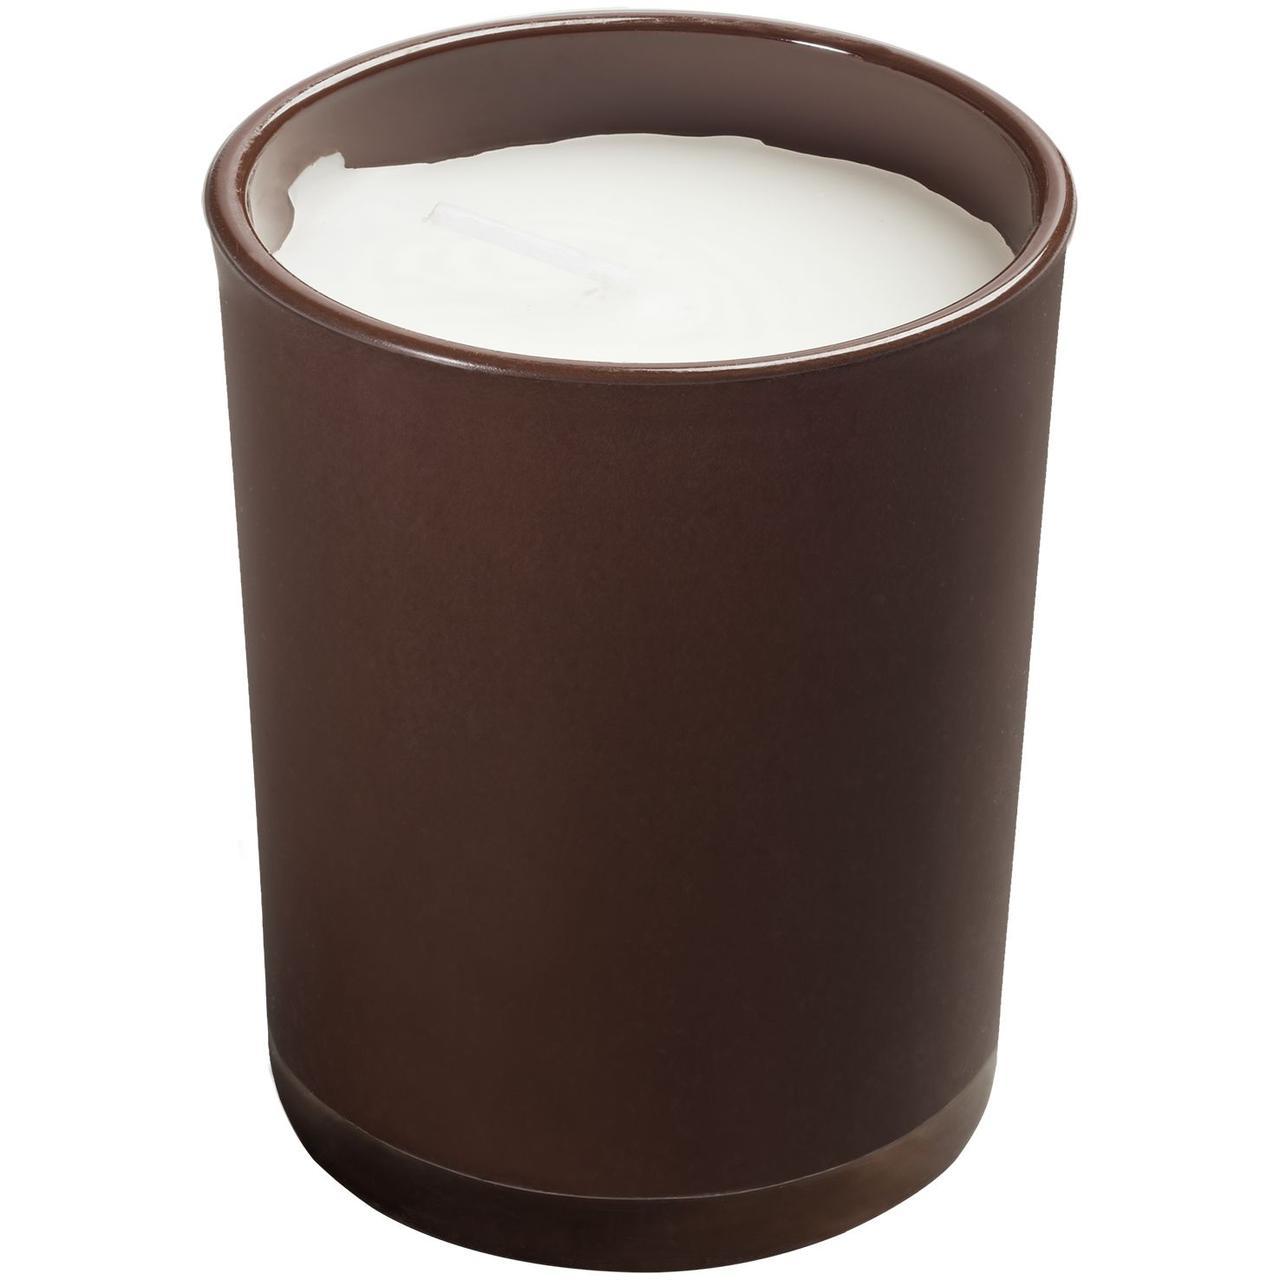 Свеча Glimmy, коричневая (артикул 7697.59)